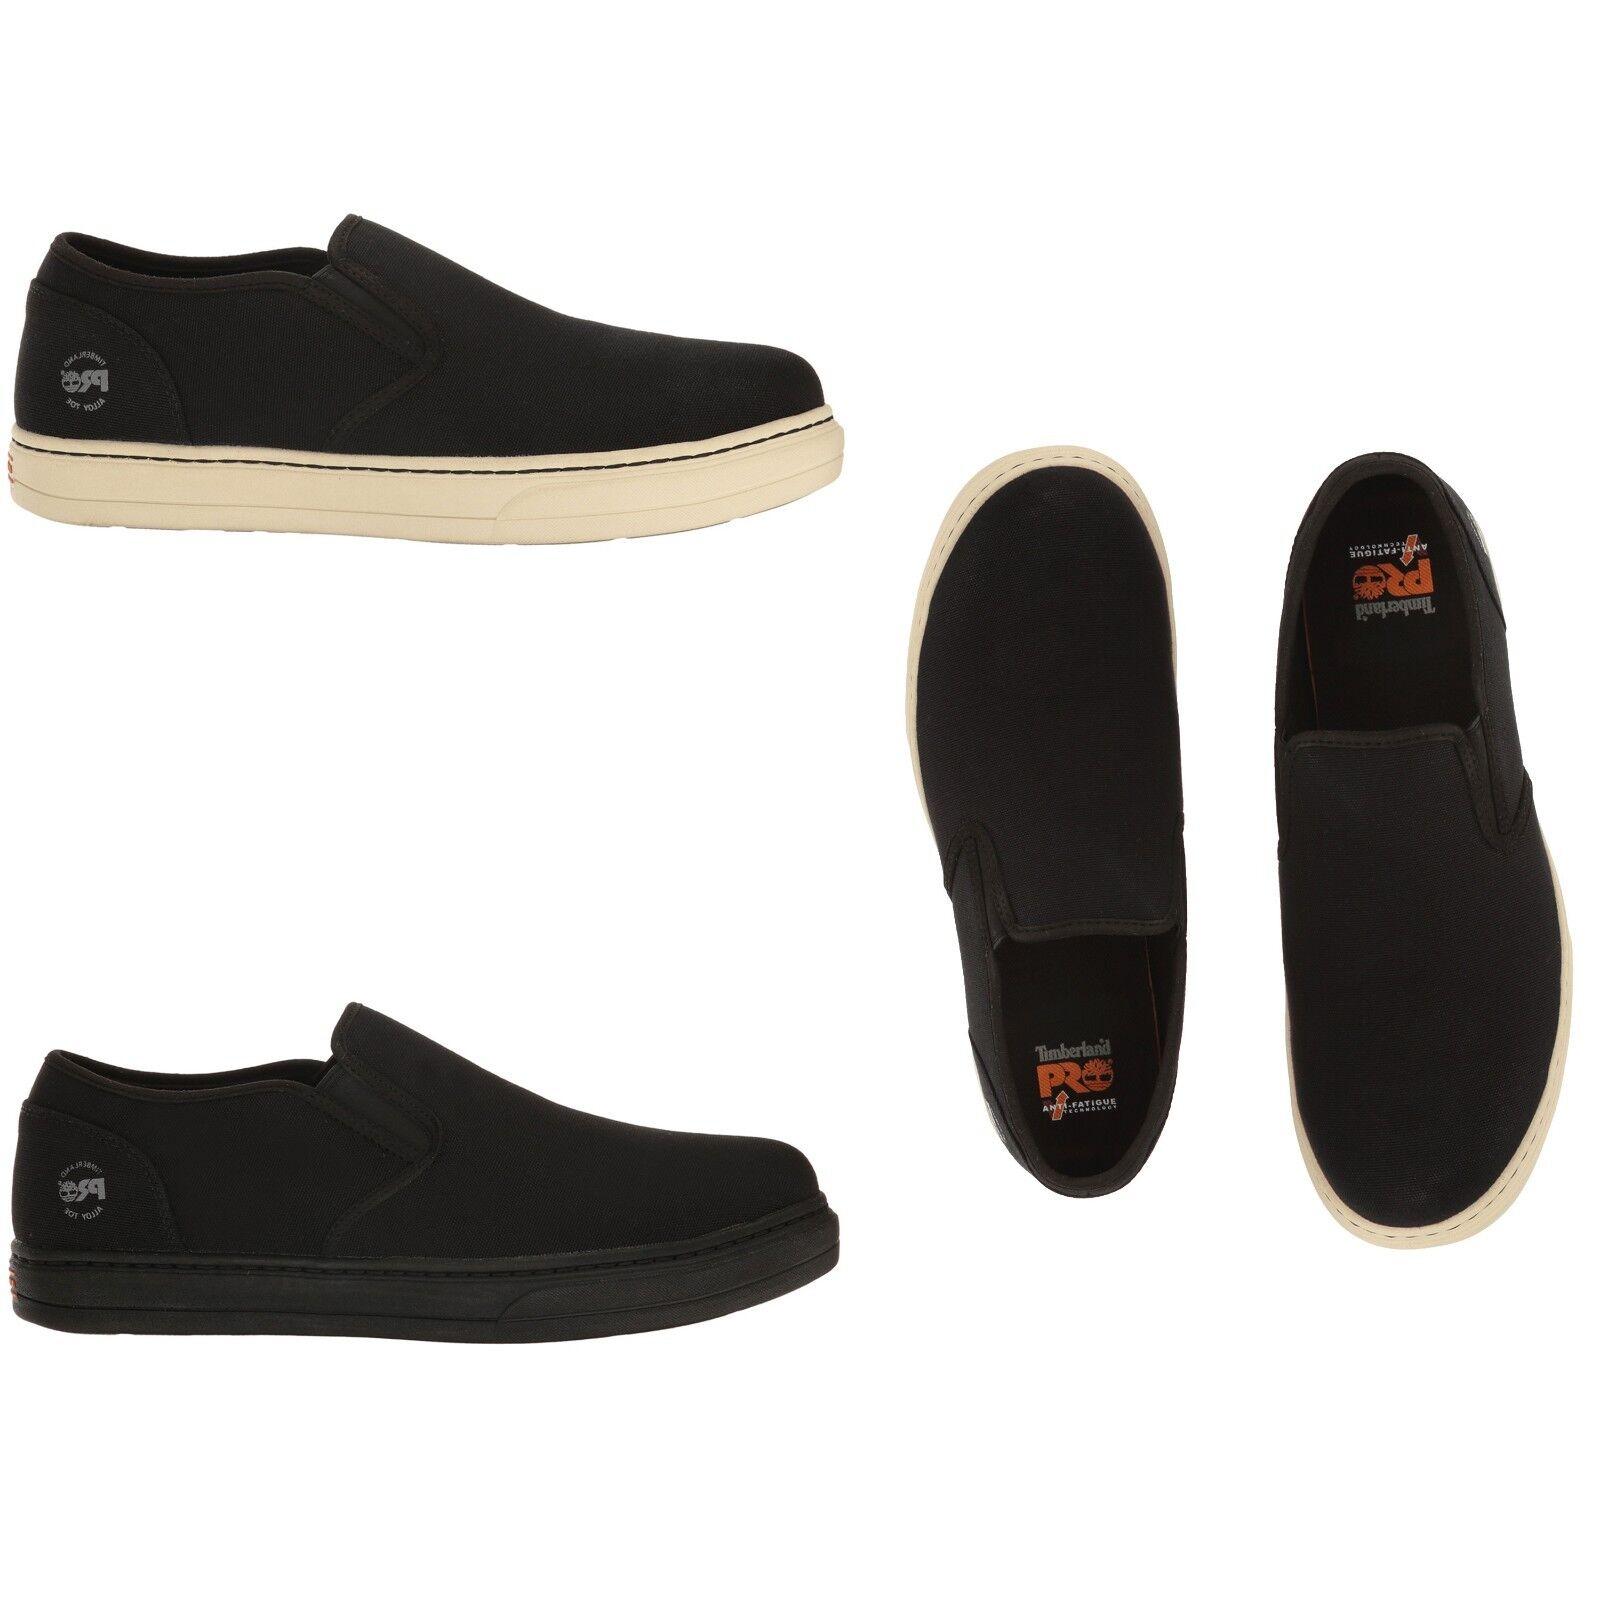 Timberland PRO Men Disruptor AlloyToe Slip-On Oil/Heat Resistant Work Shoes WIDE